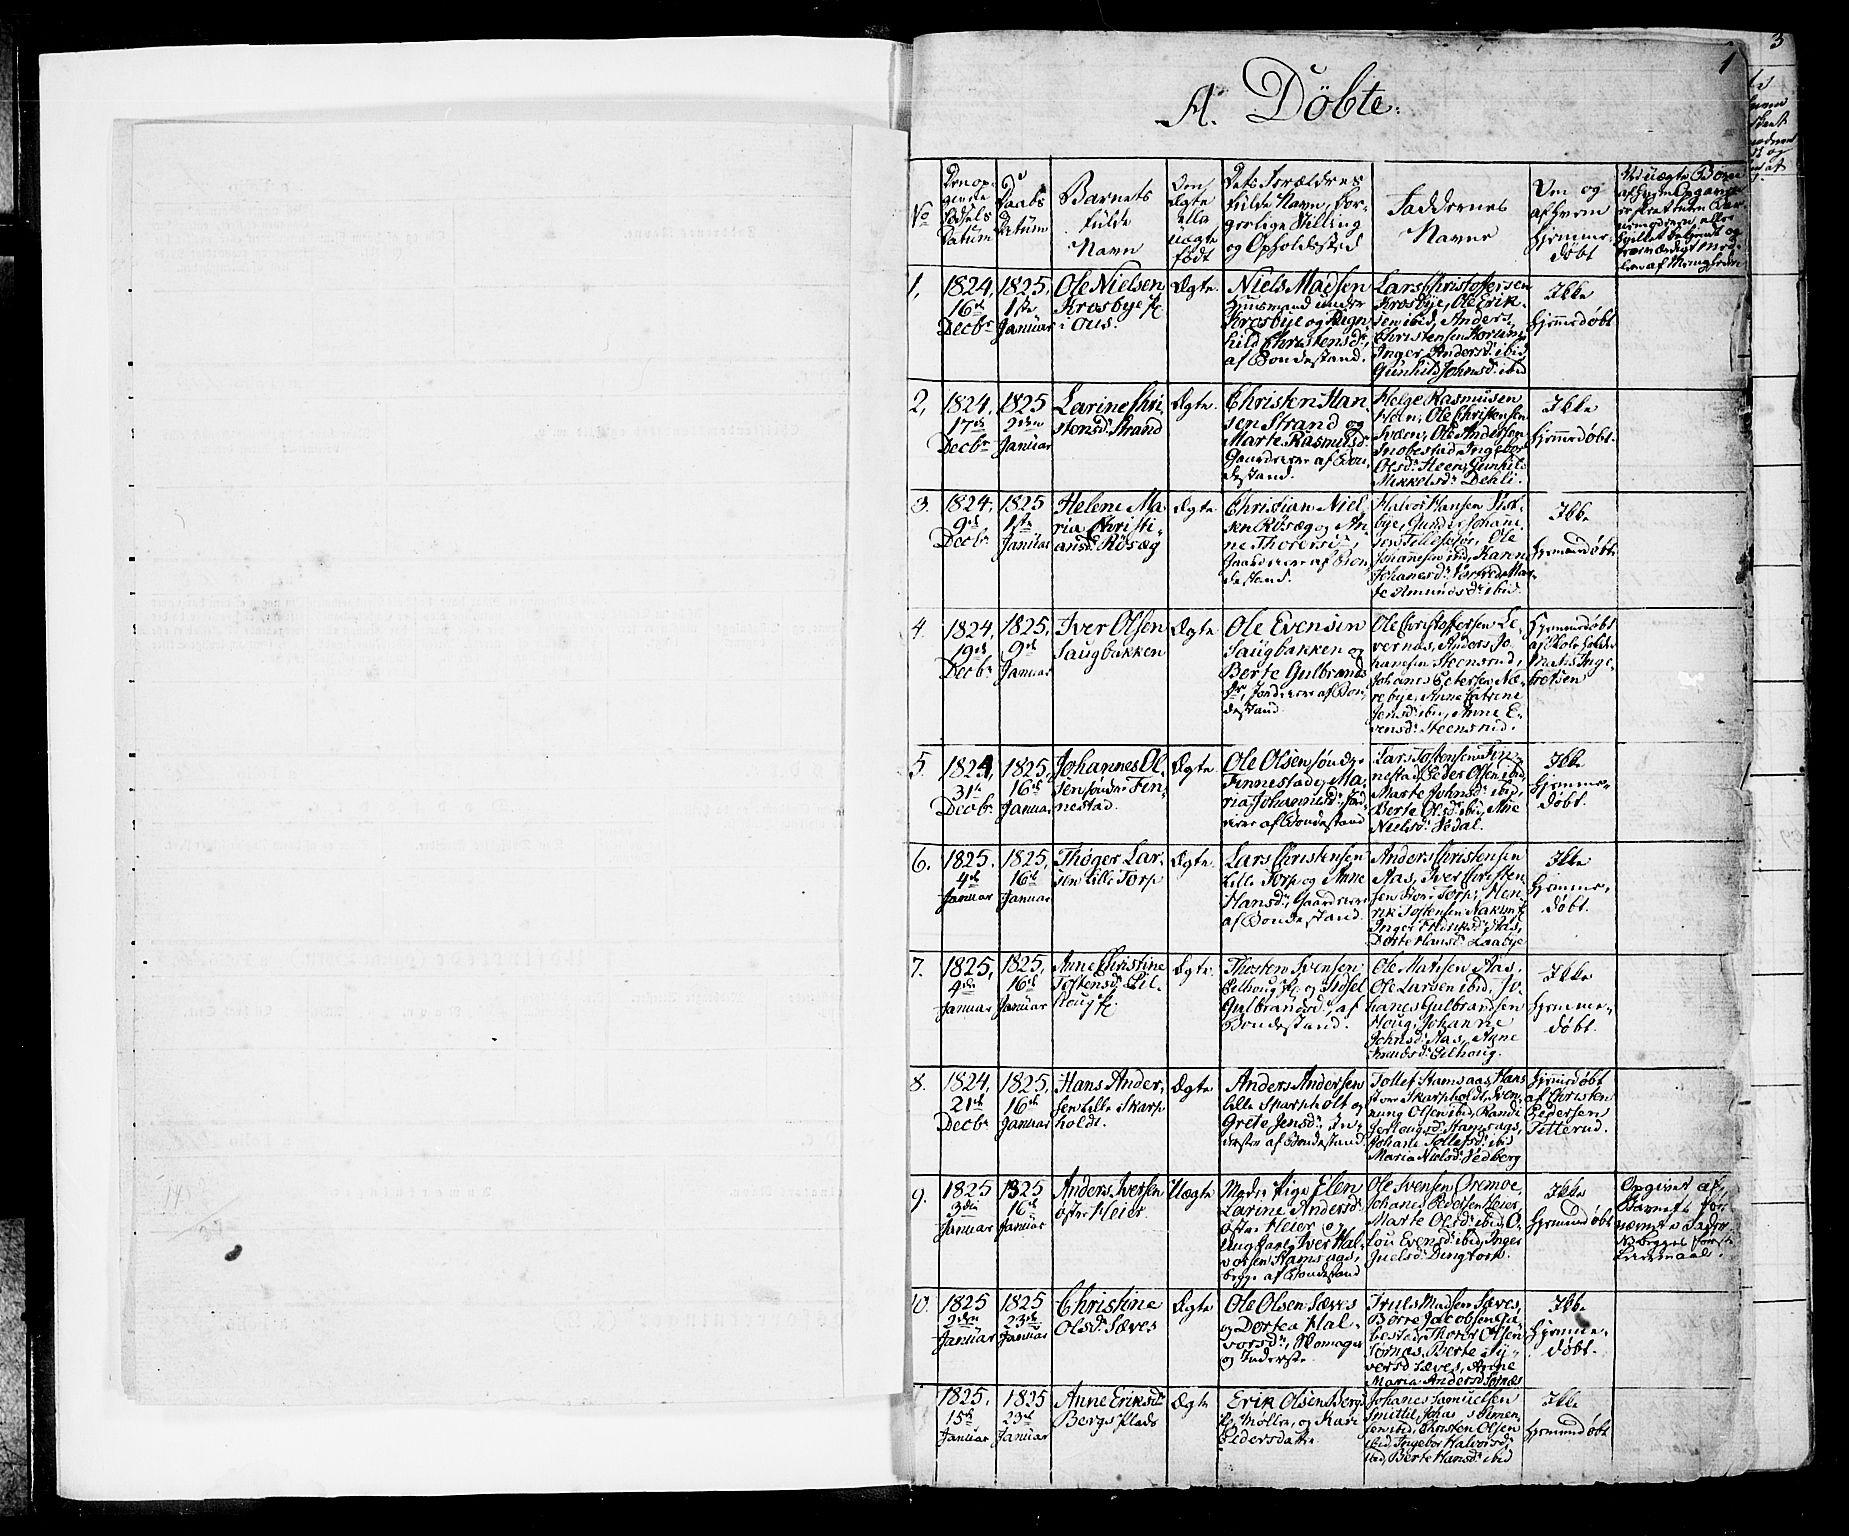 SAO, Rakkestad prestekontor Kirkebøker, F/Fa/L0007: Parish register (official) no. I 7, 1825-1841, p. 1